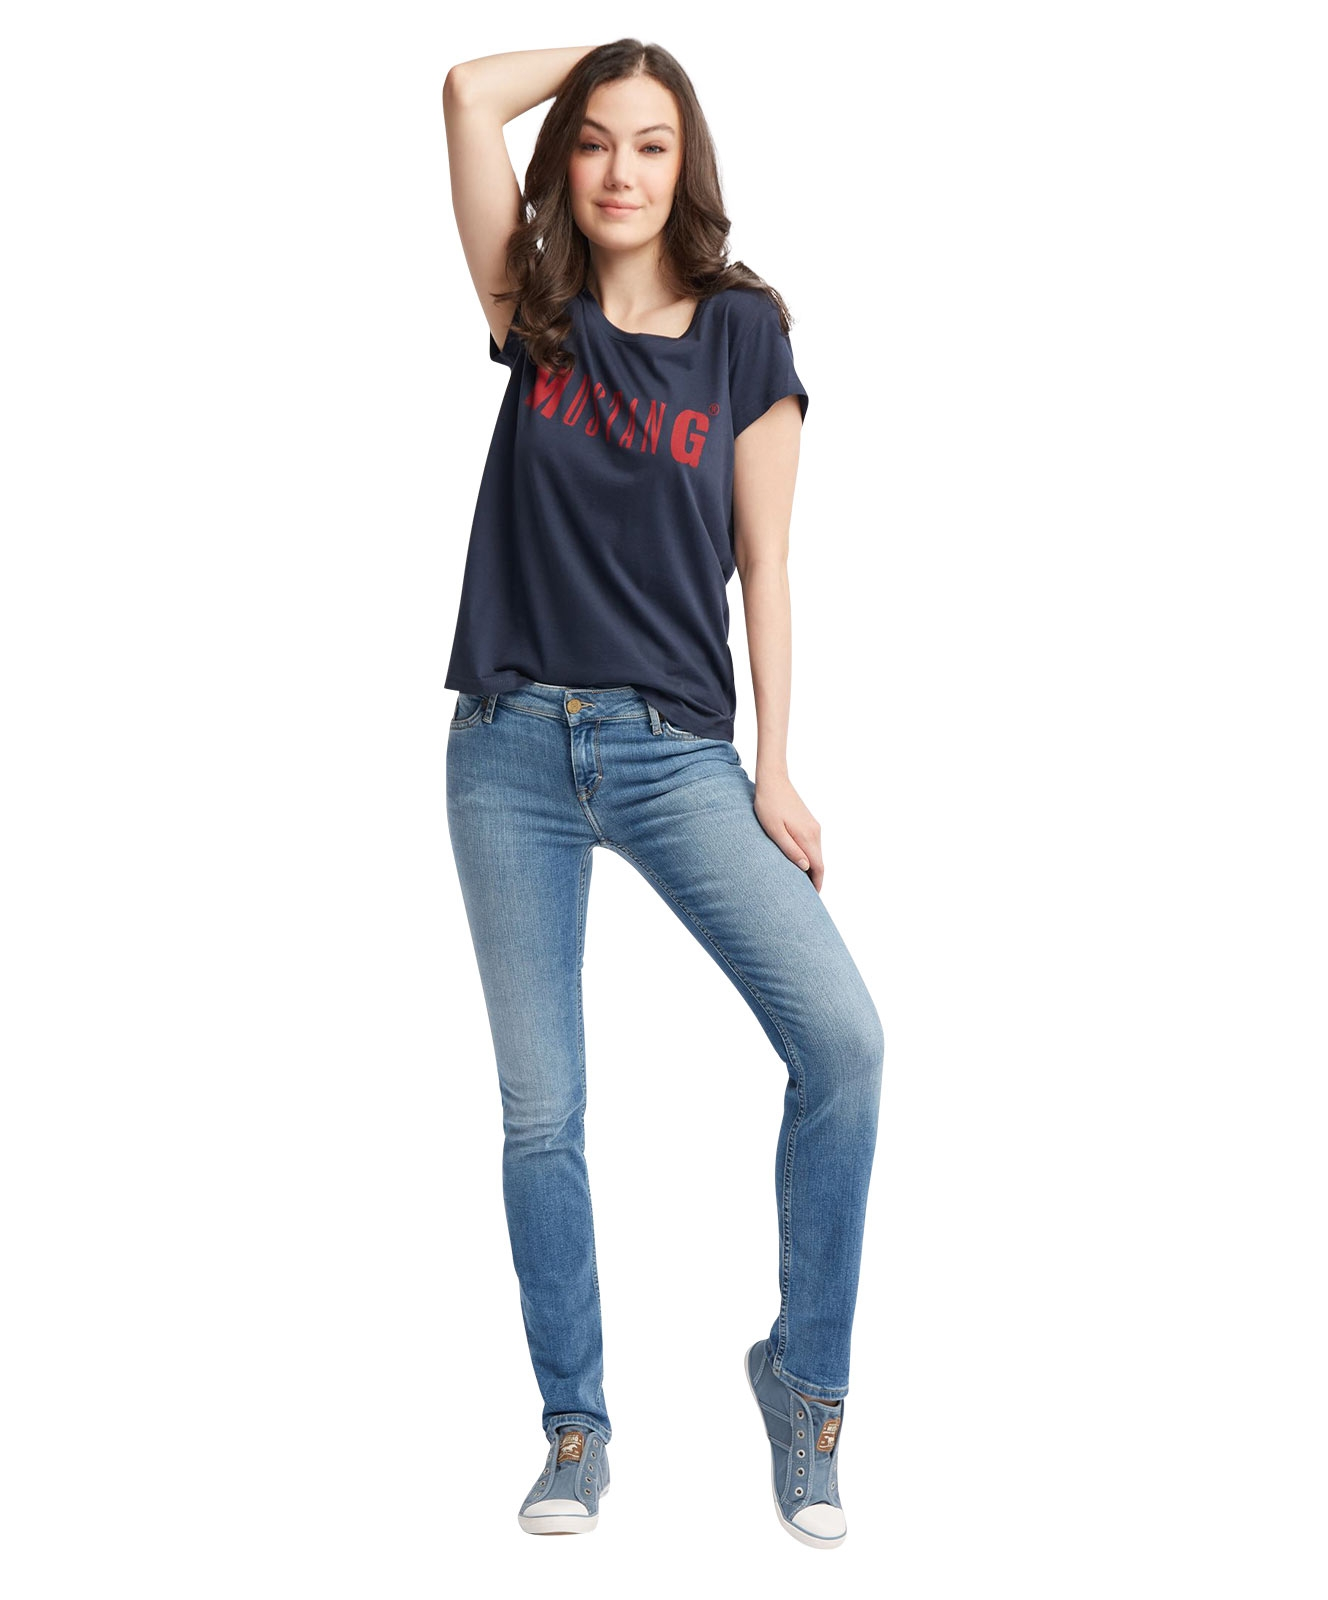 Hosen - Mustang Slim Fit Jeans Jasmin Slim in Light Blue  - Onlineshop Jeans Meile